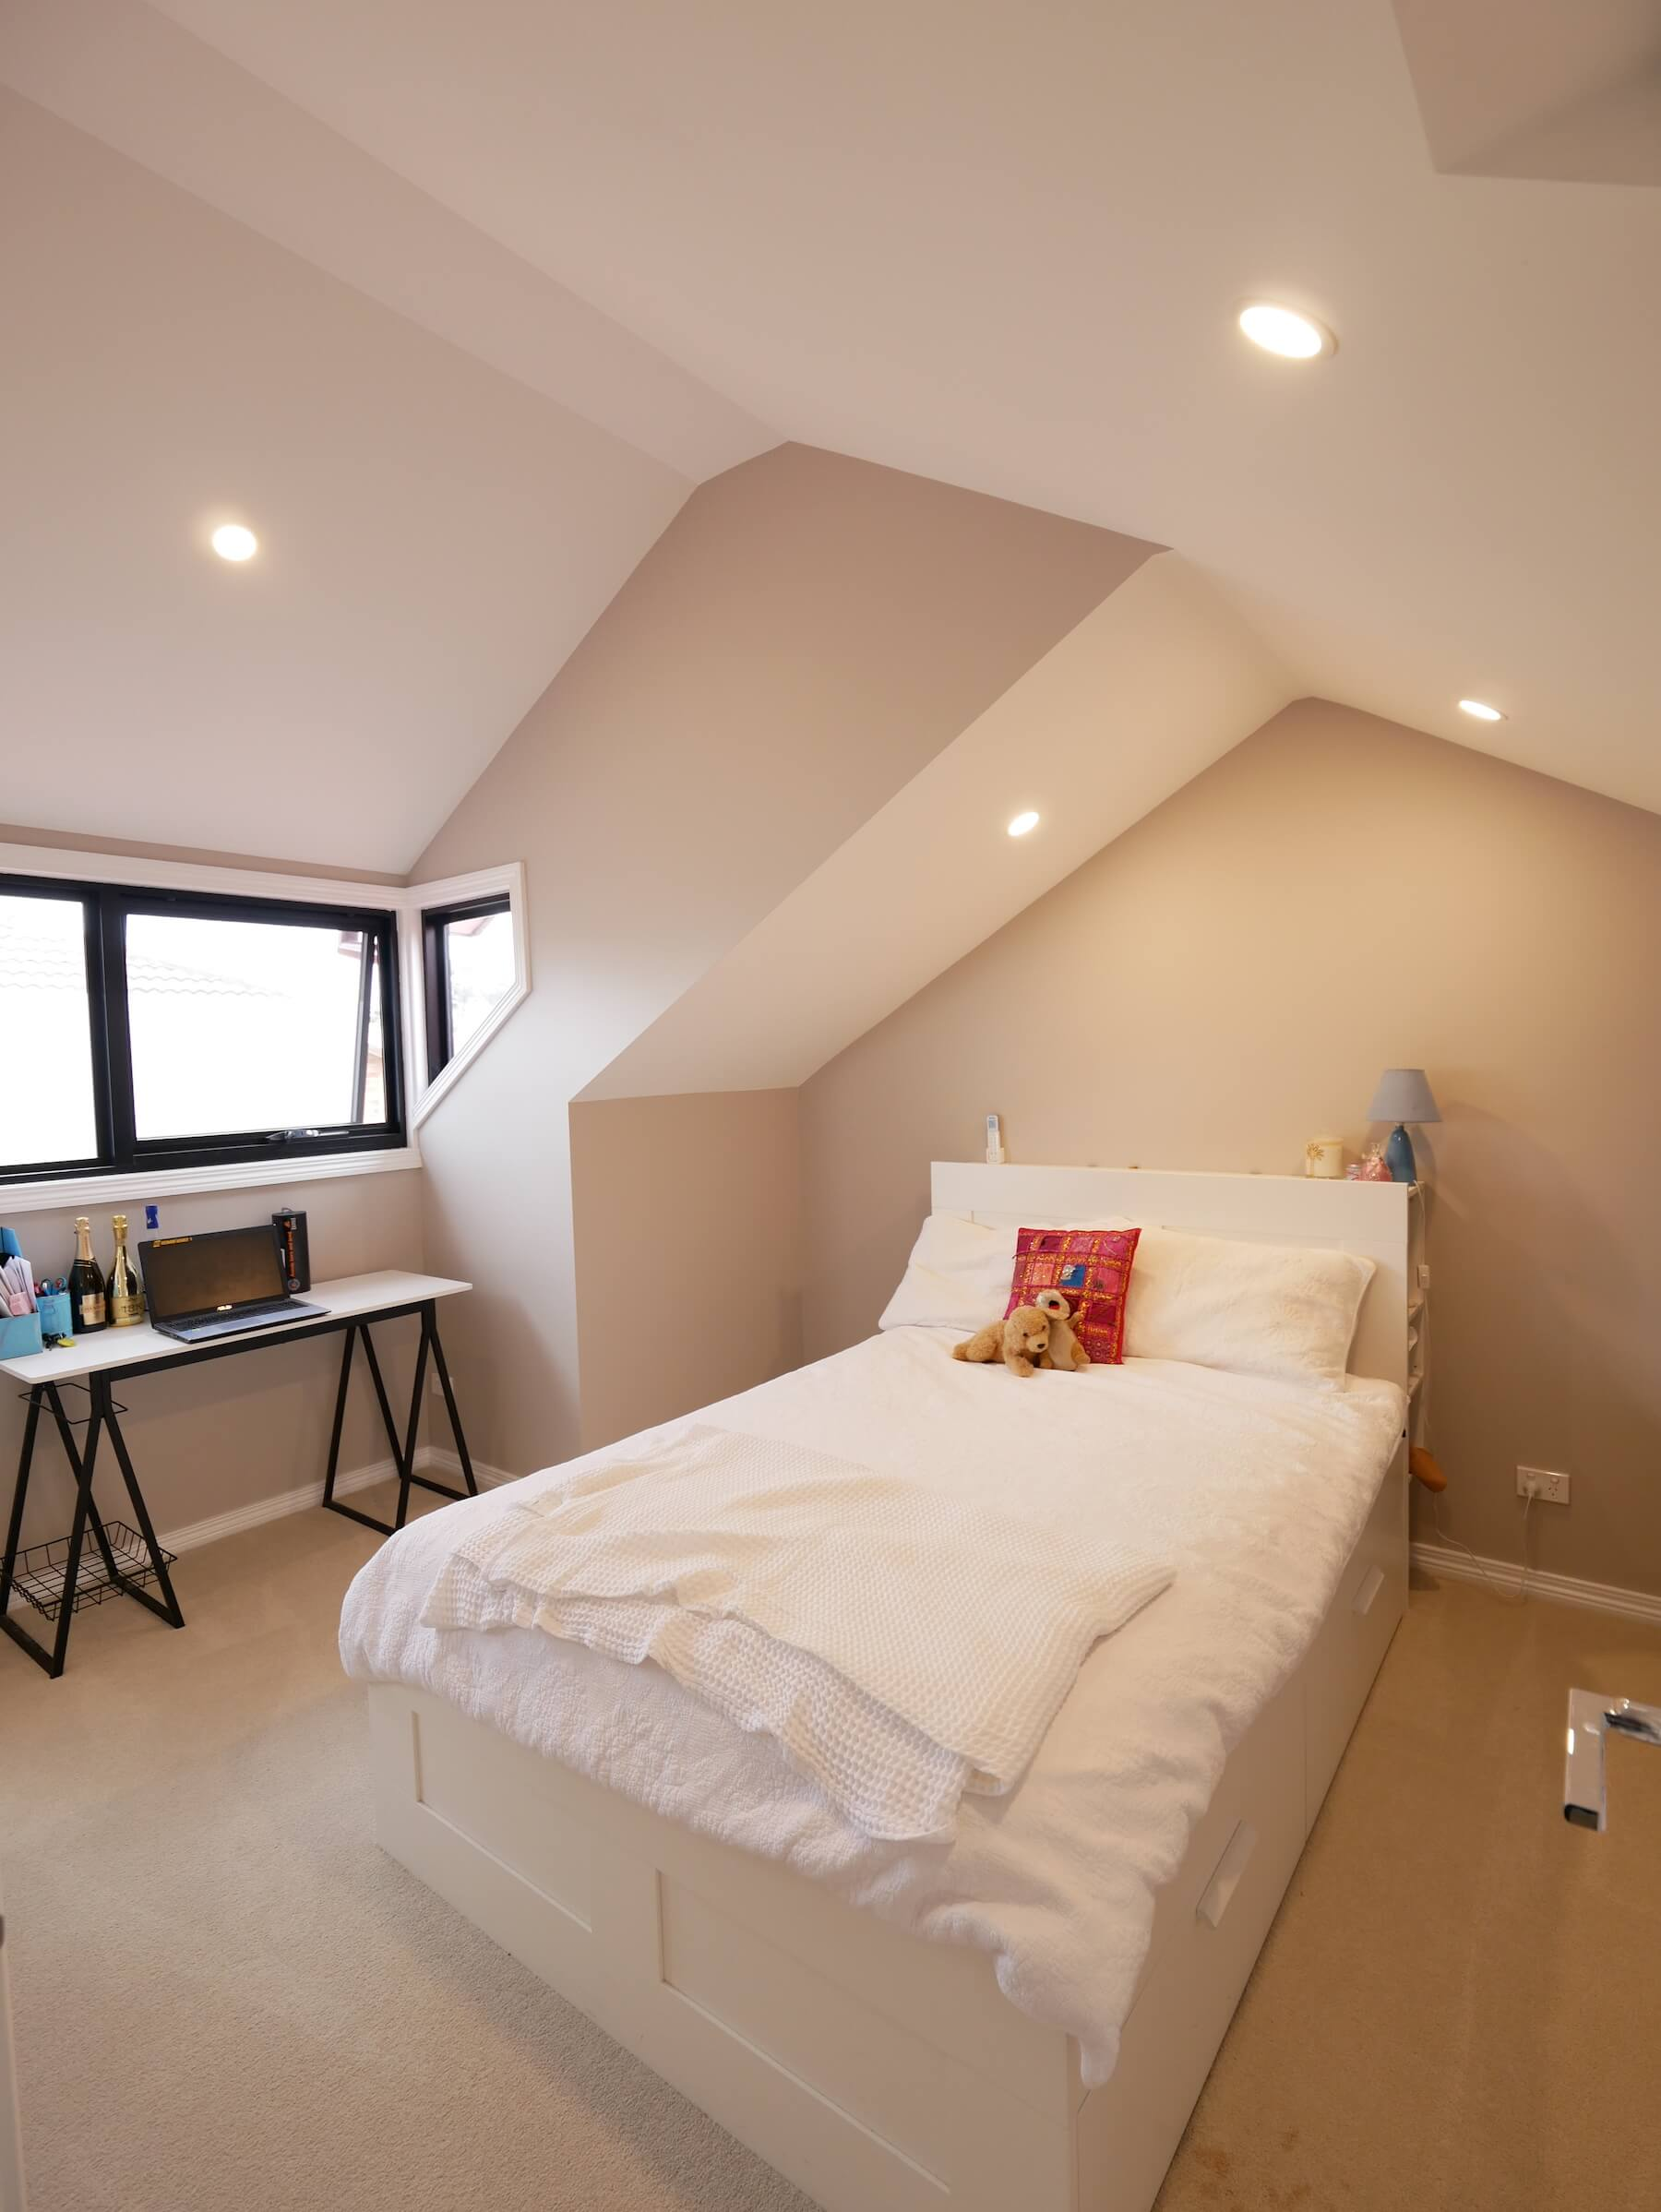 bedroom in attic.JPG